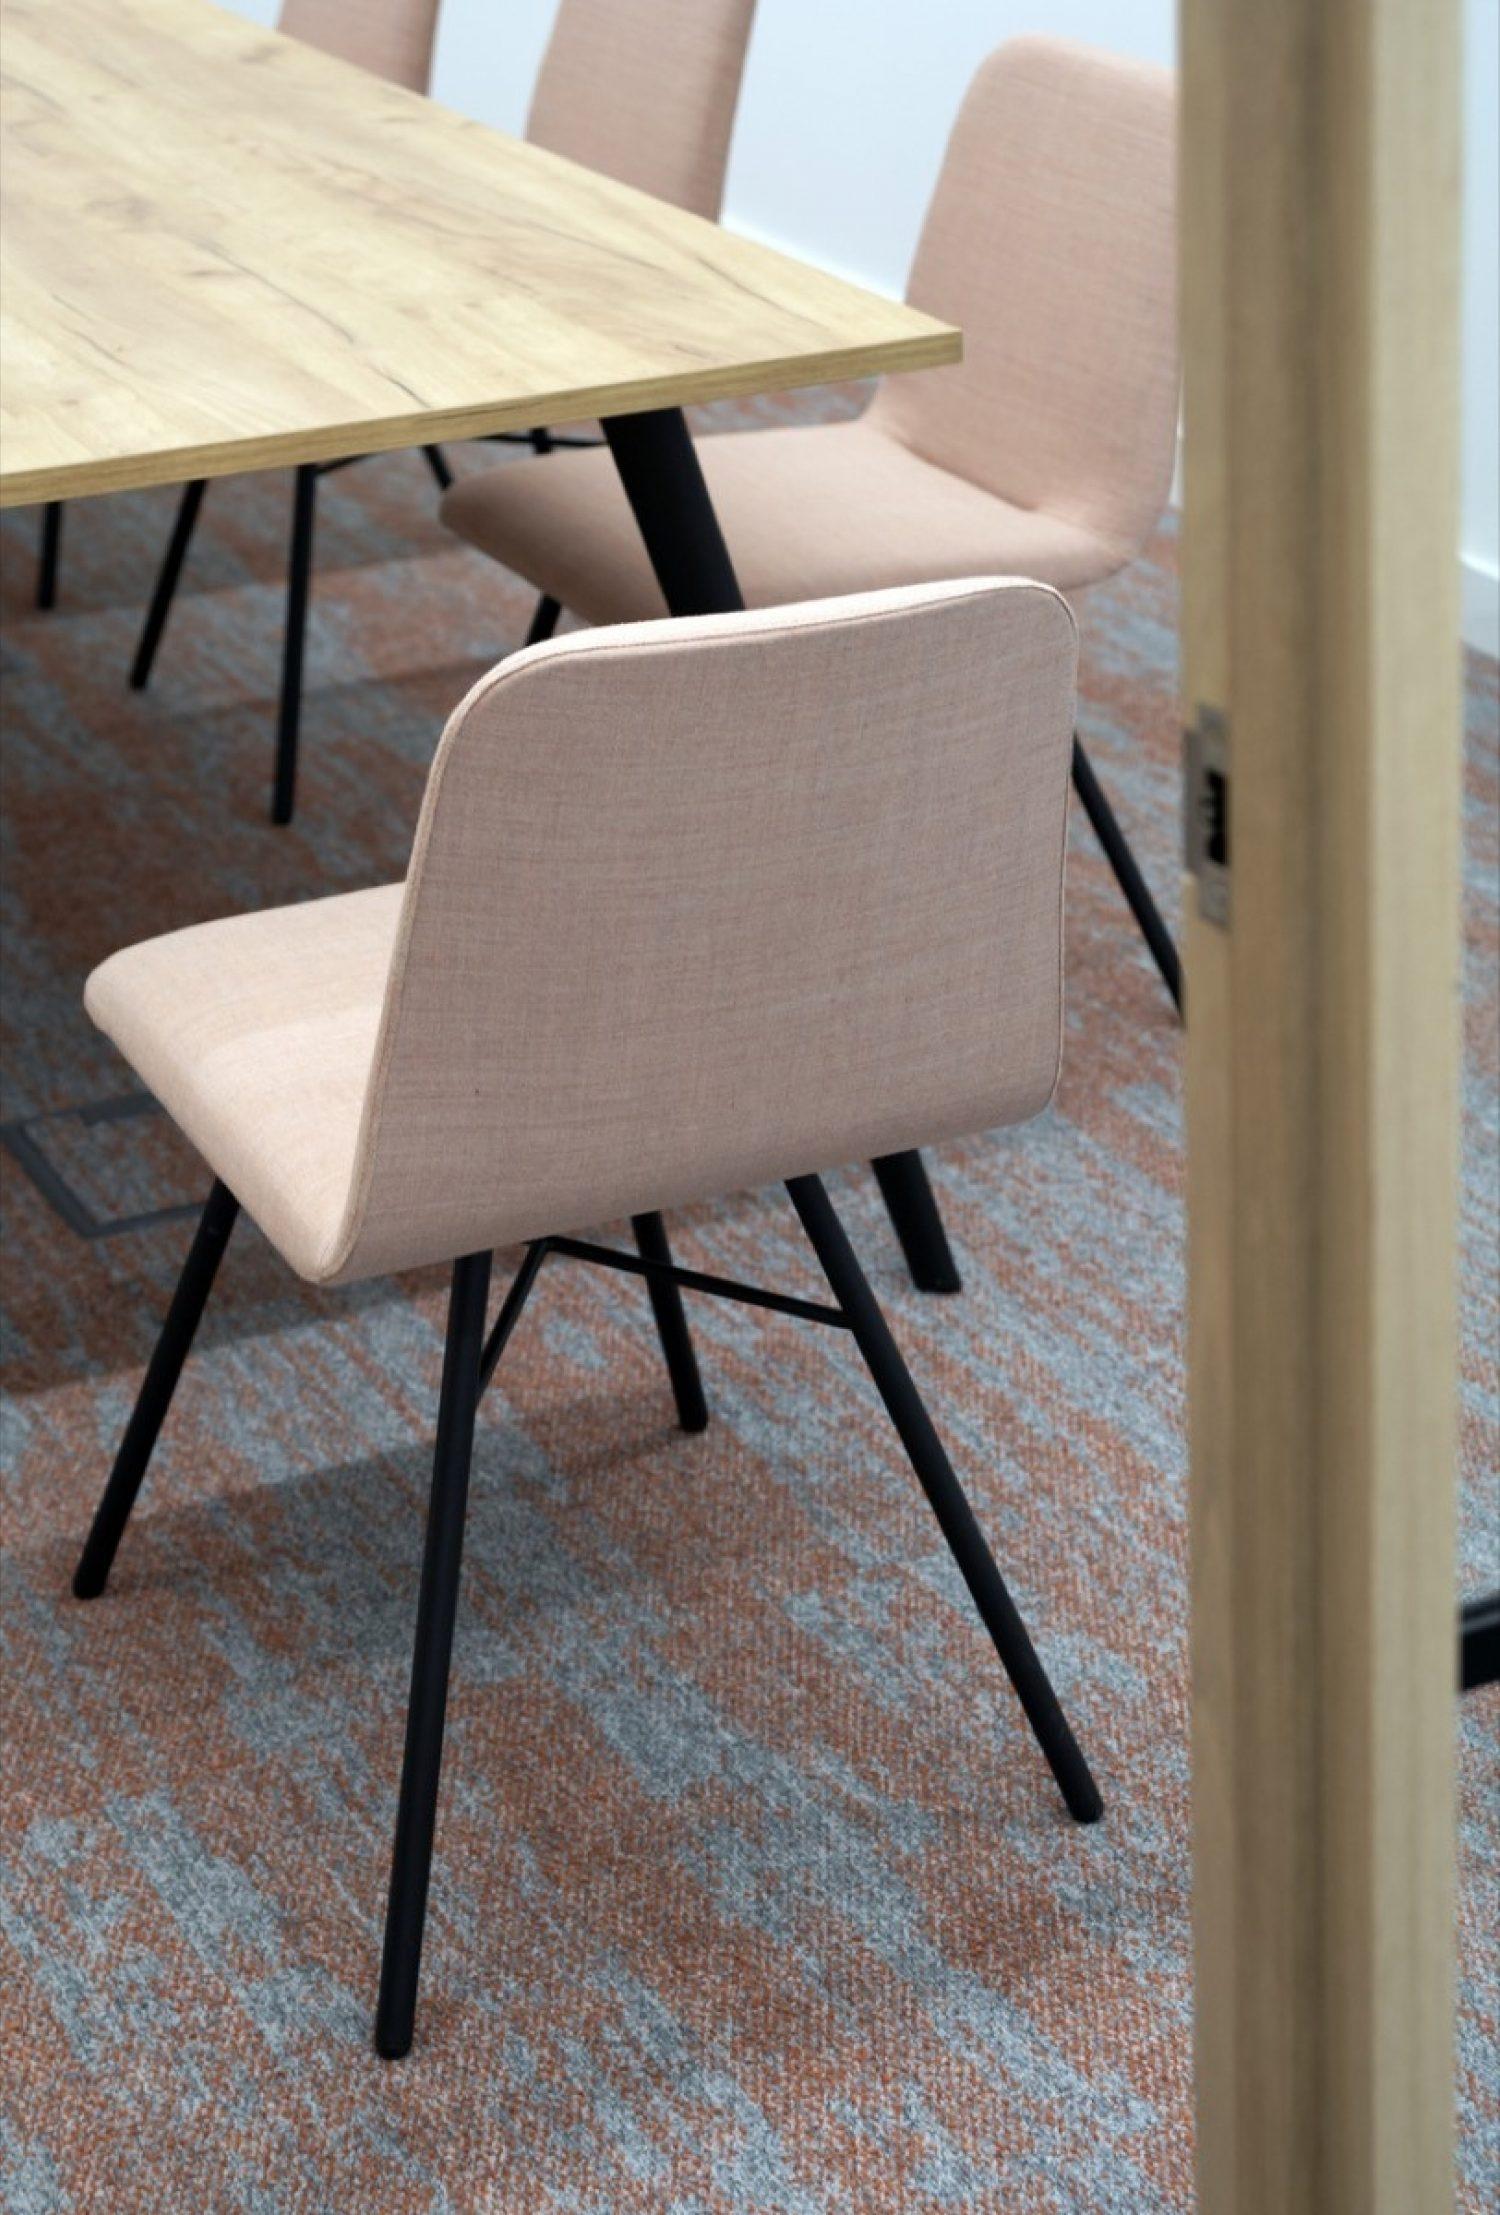 Aegon office space design